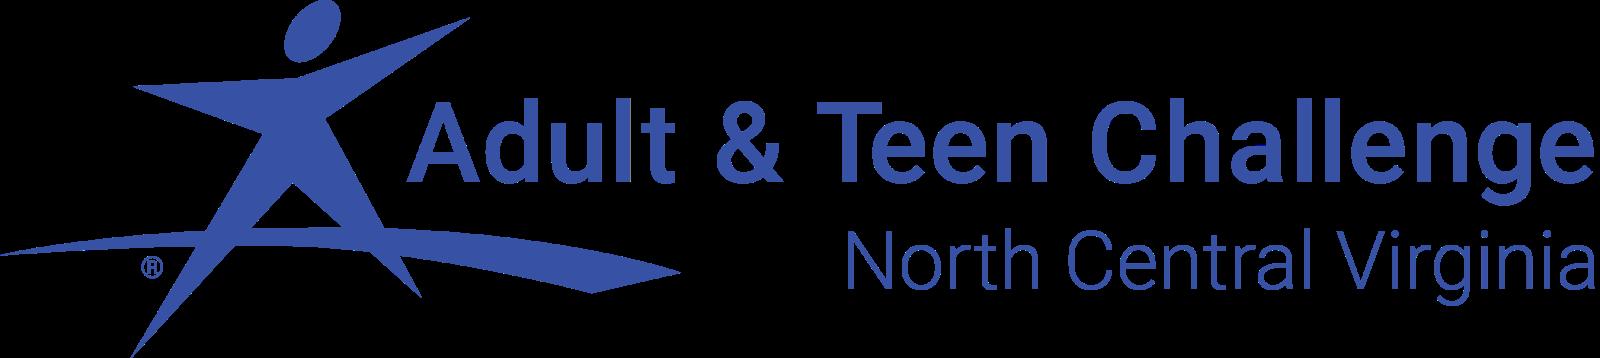 Teen Challenge North Central Virginia